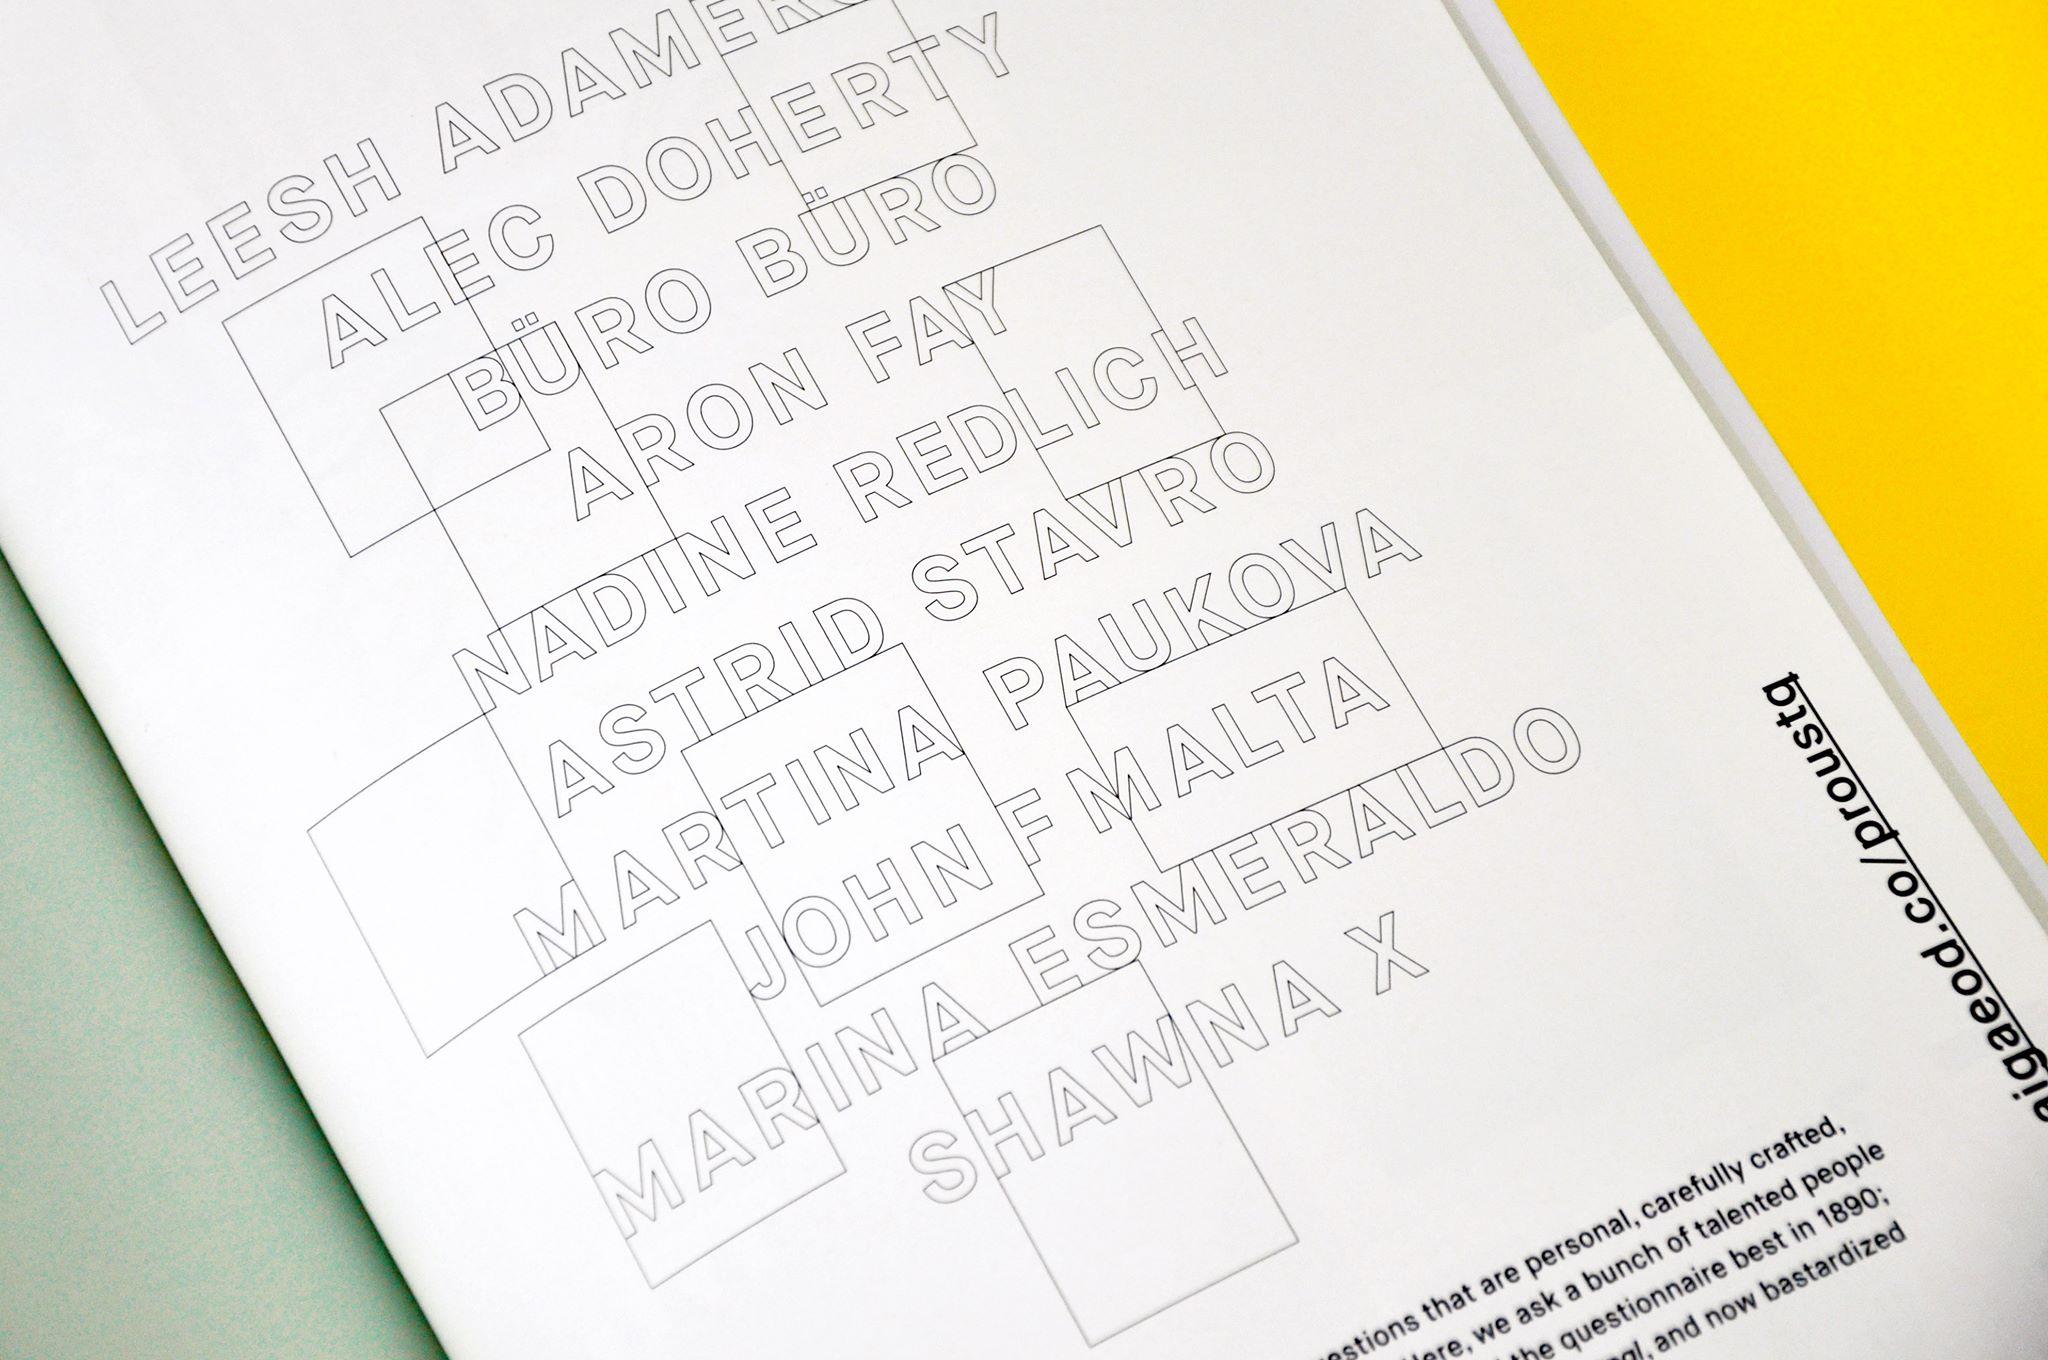 aiga eye on design magazine 11